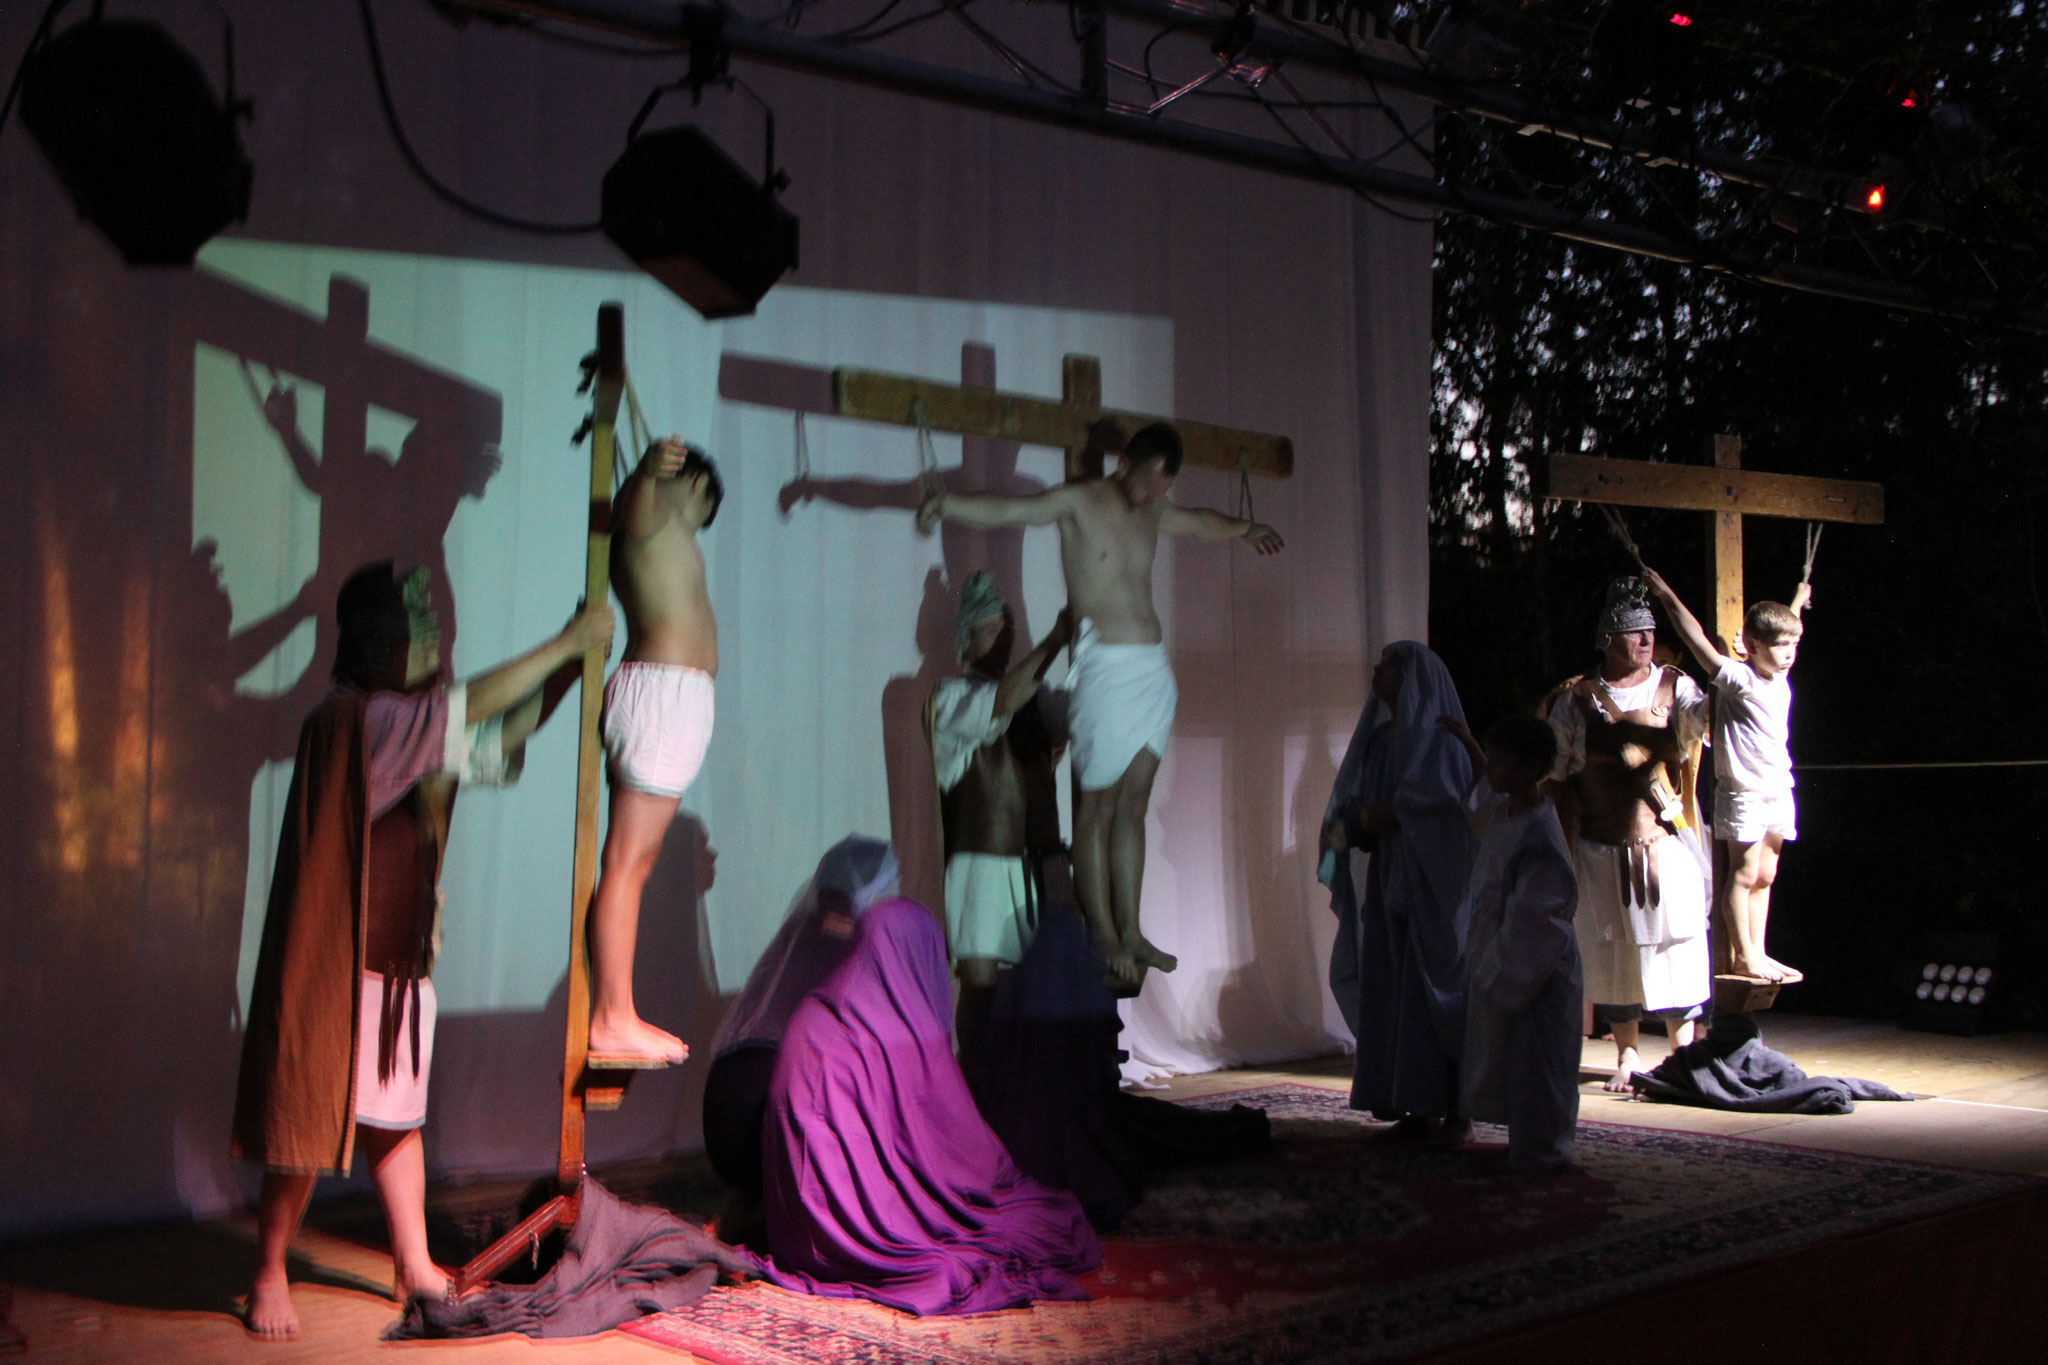 La mort en croix (c) JDR